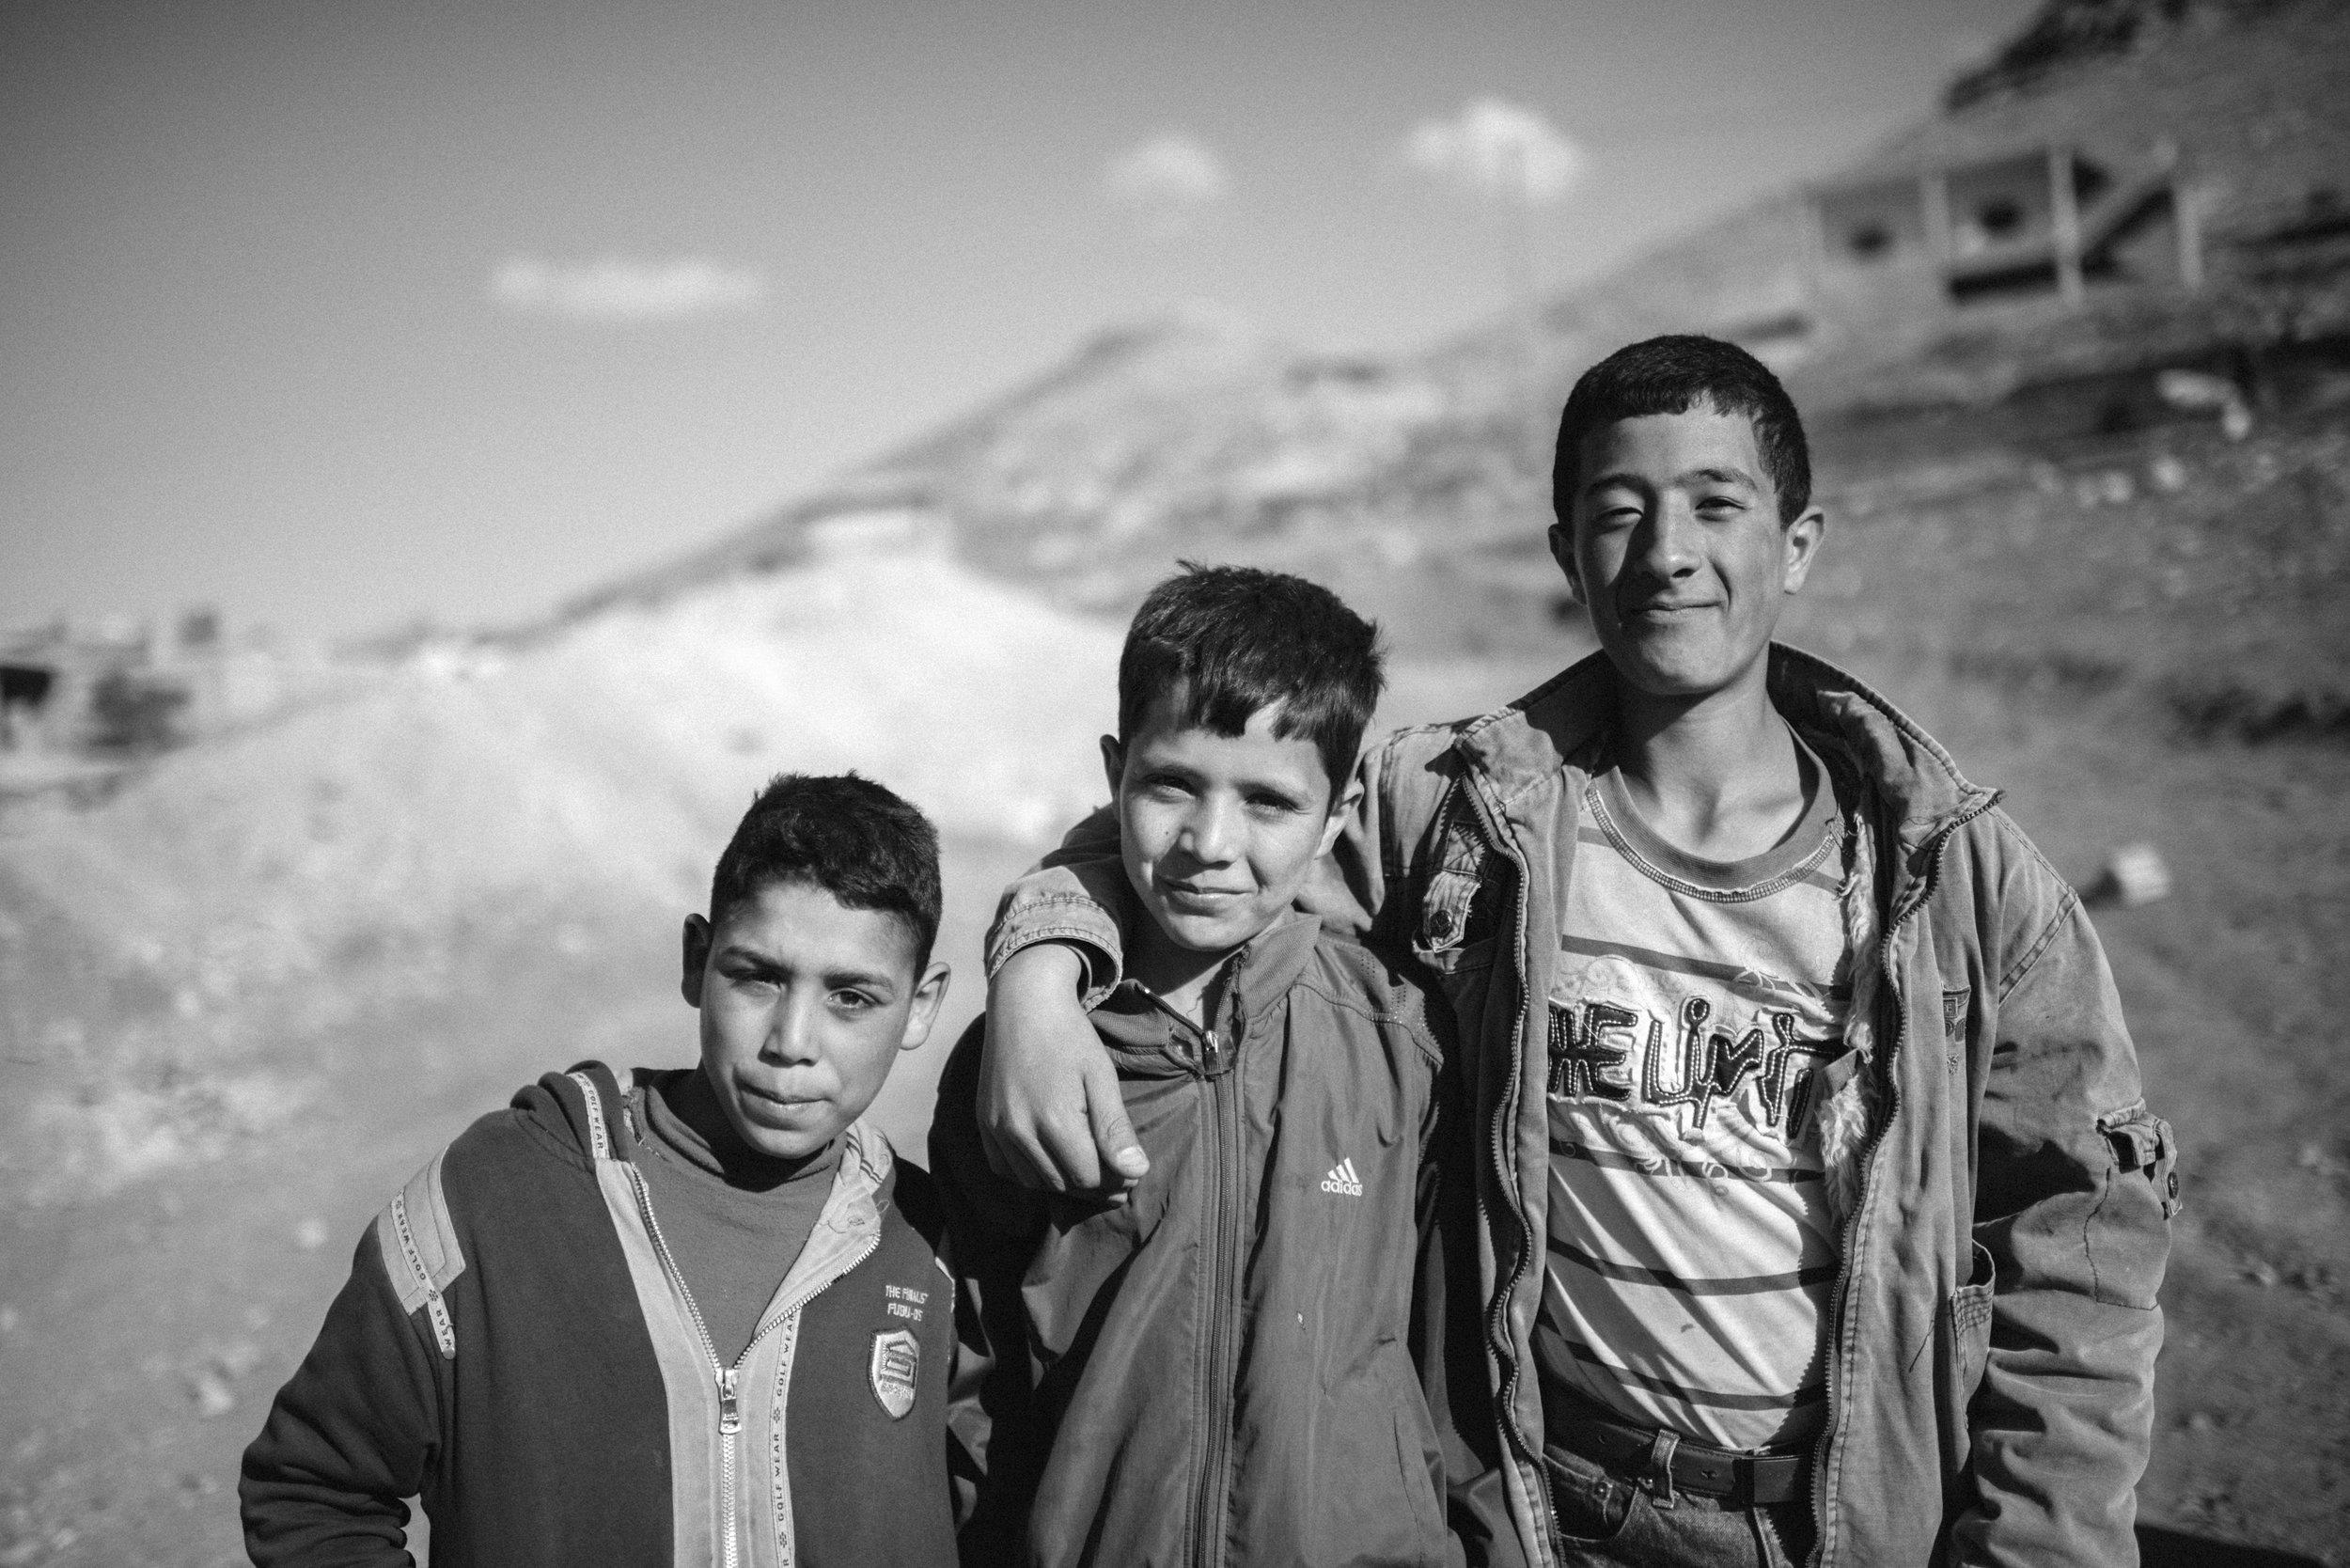 syria_bw_new_web_032.JPG